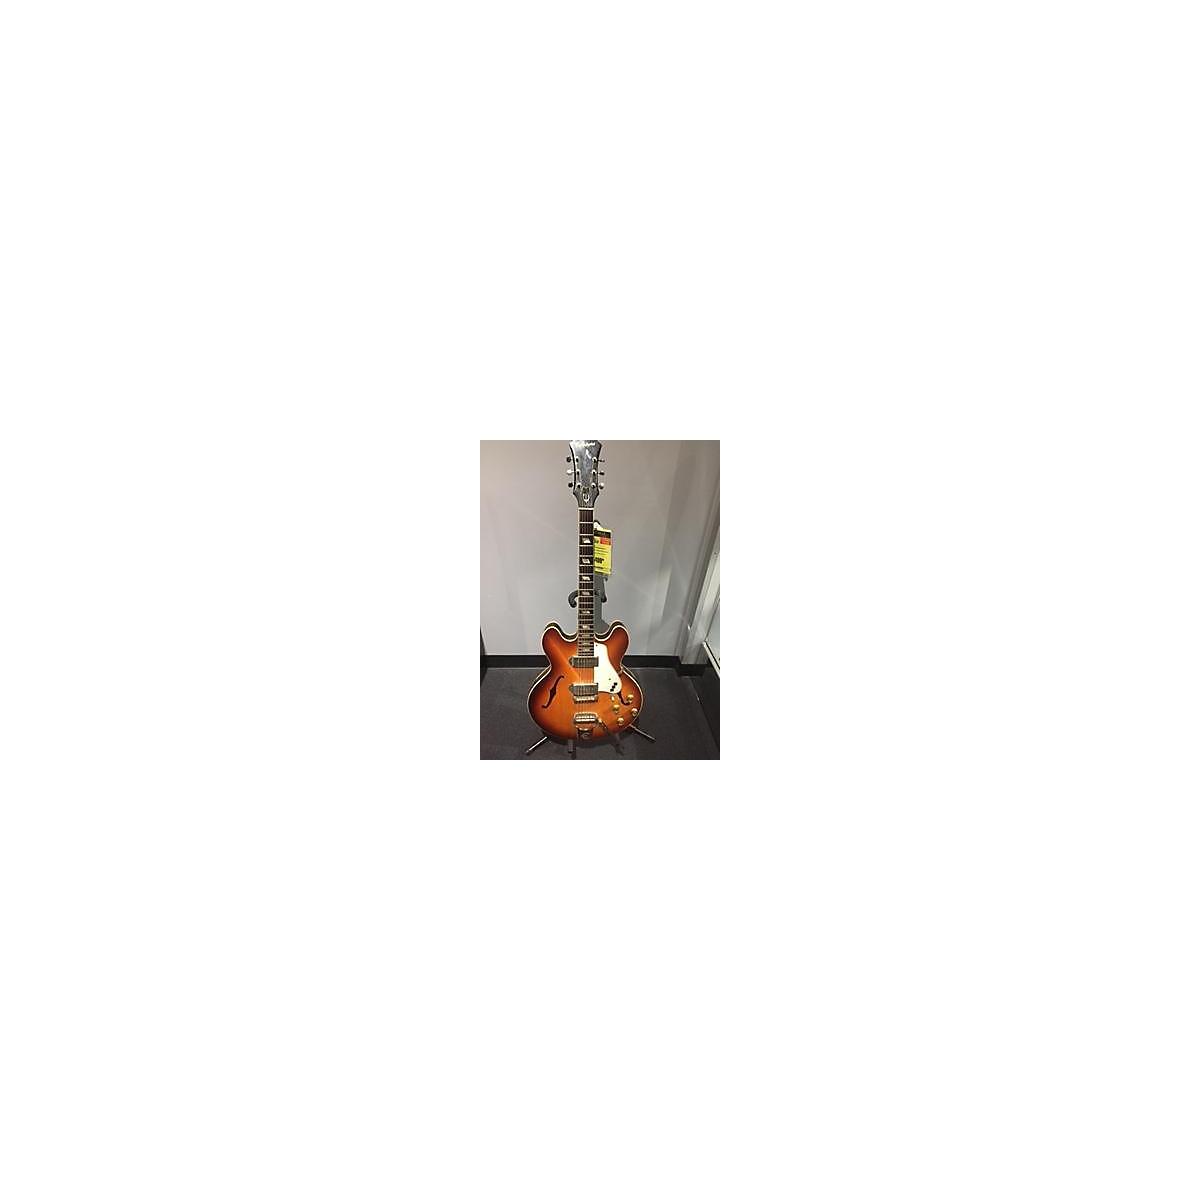 Epiphone 1966 Casino Hollow Body Electric Guitar